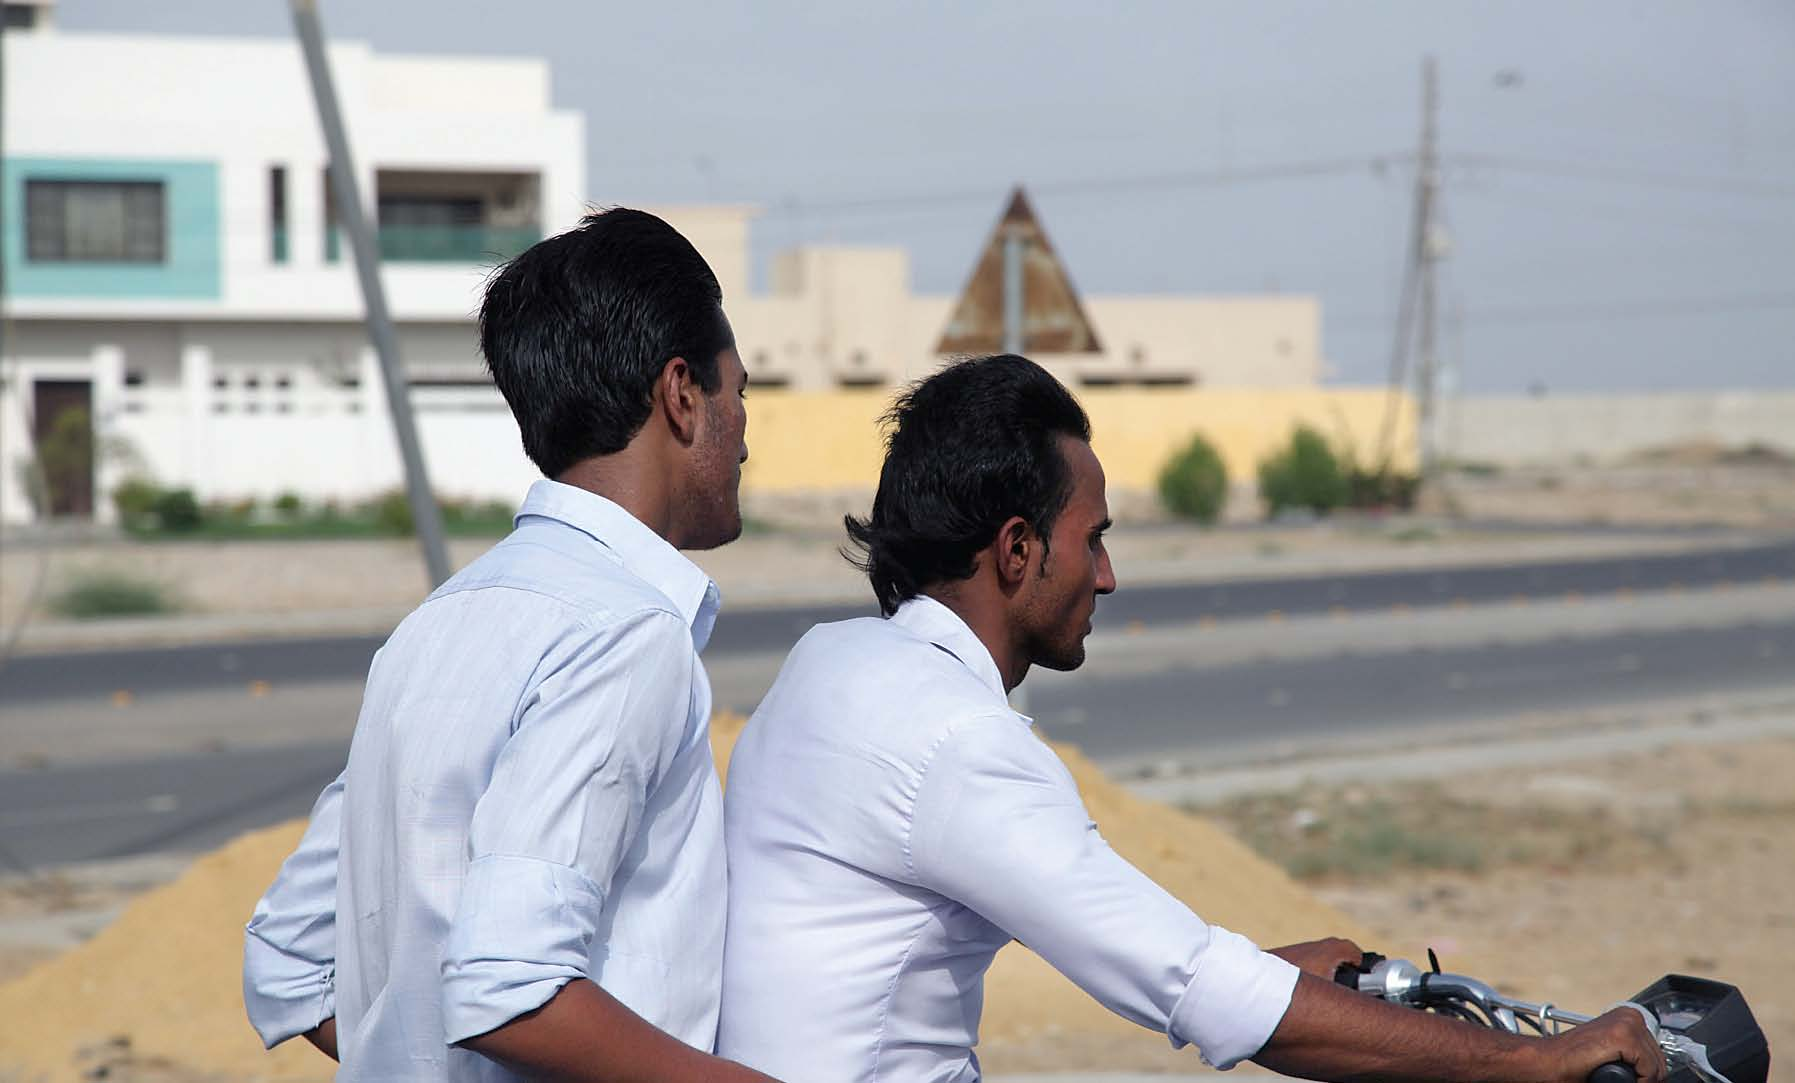 pillion riding banned in karachi in wake of maulana adil s assassination